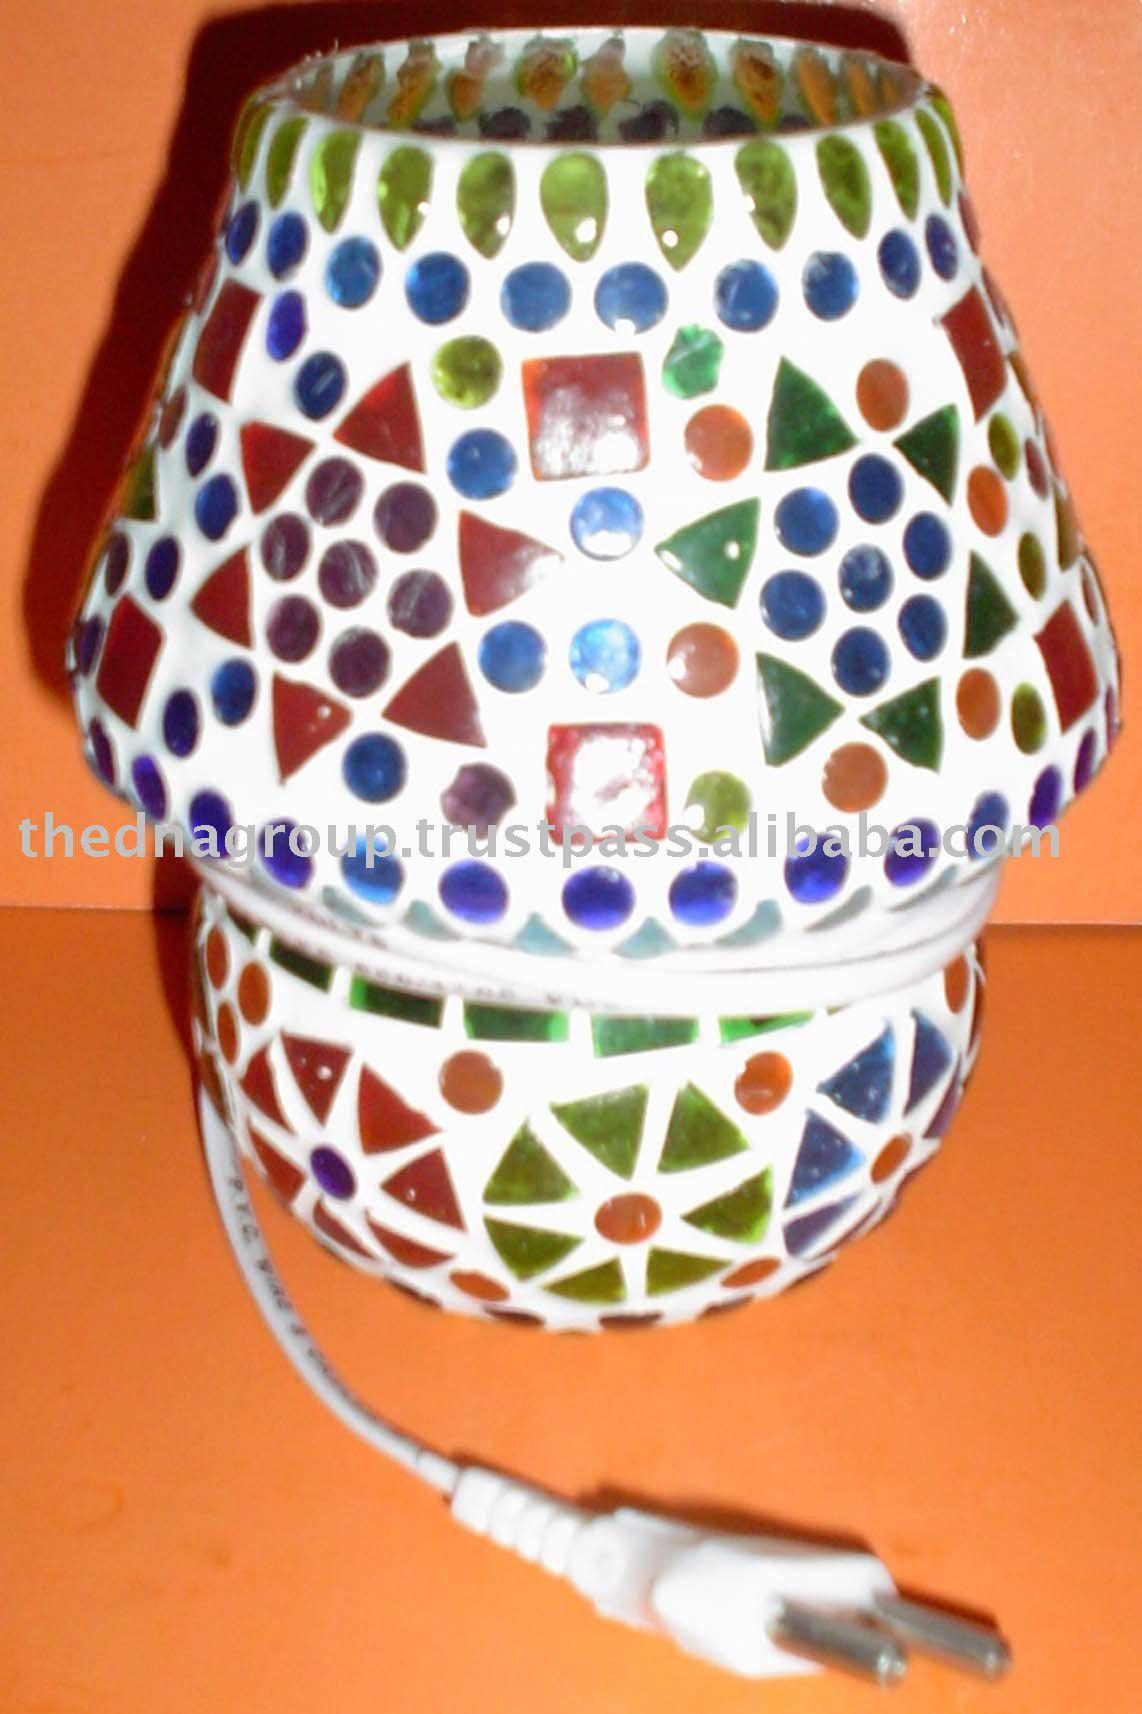 India antigua de cristal l mparas l mparas decorativas - Lamparas de la india ...